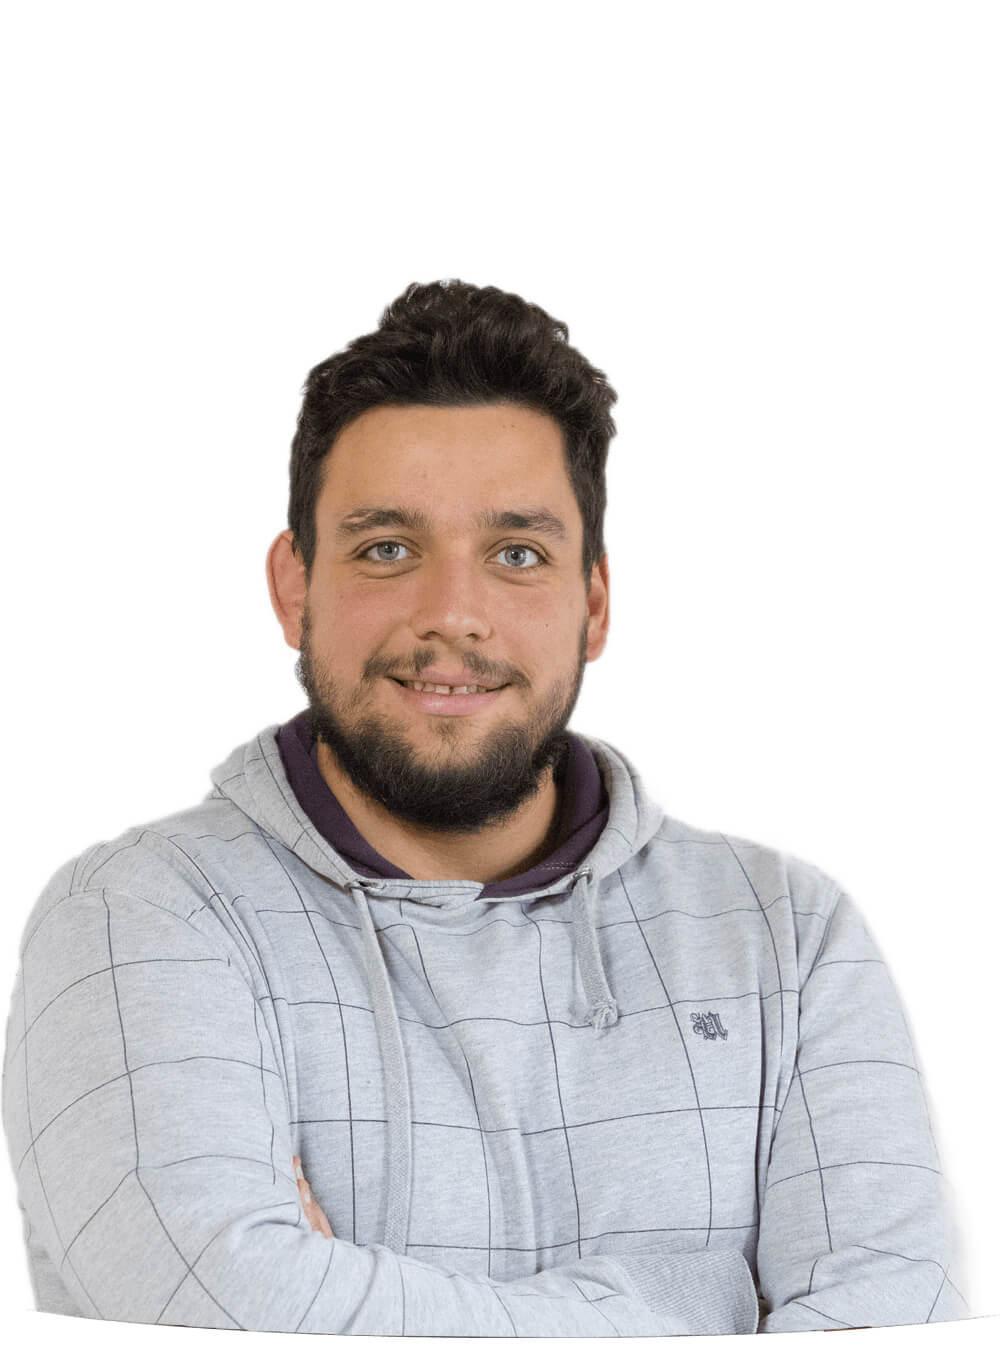 Giuseppe Linoolmostudio